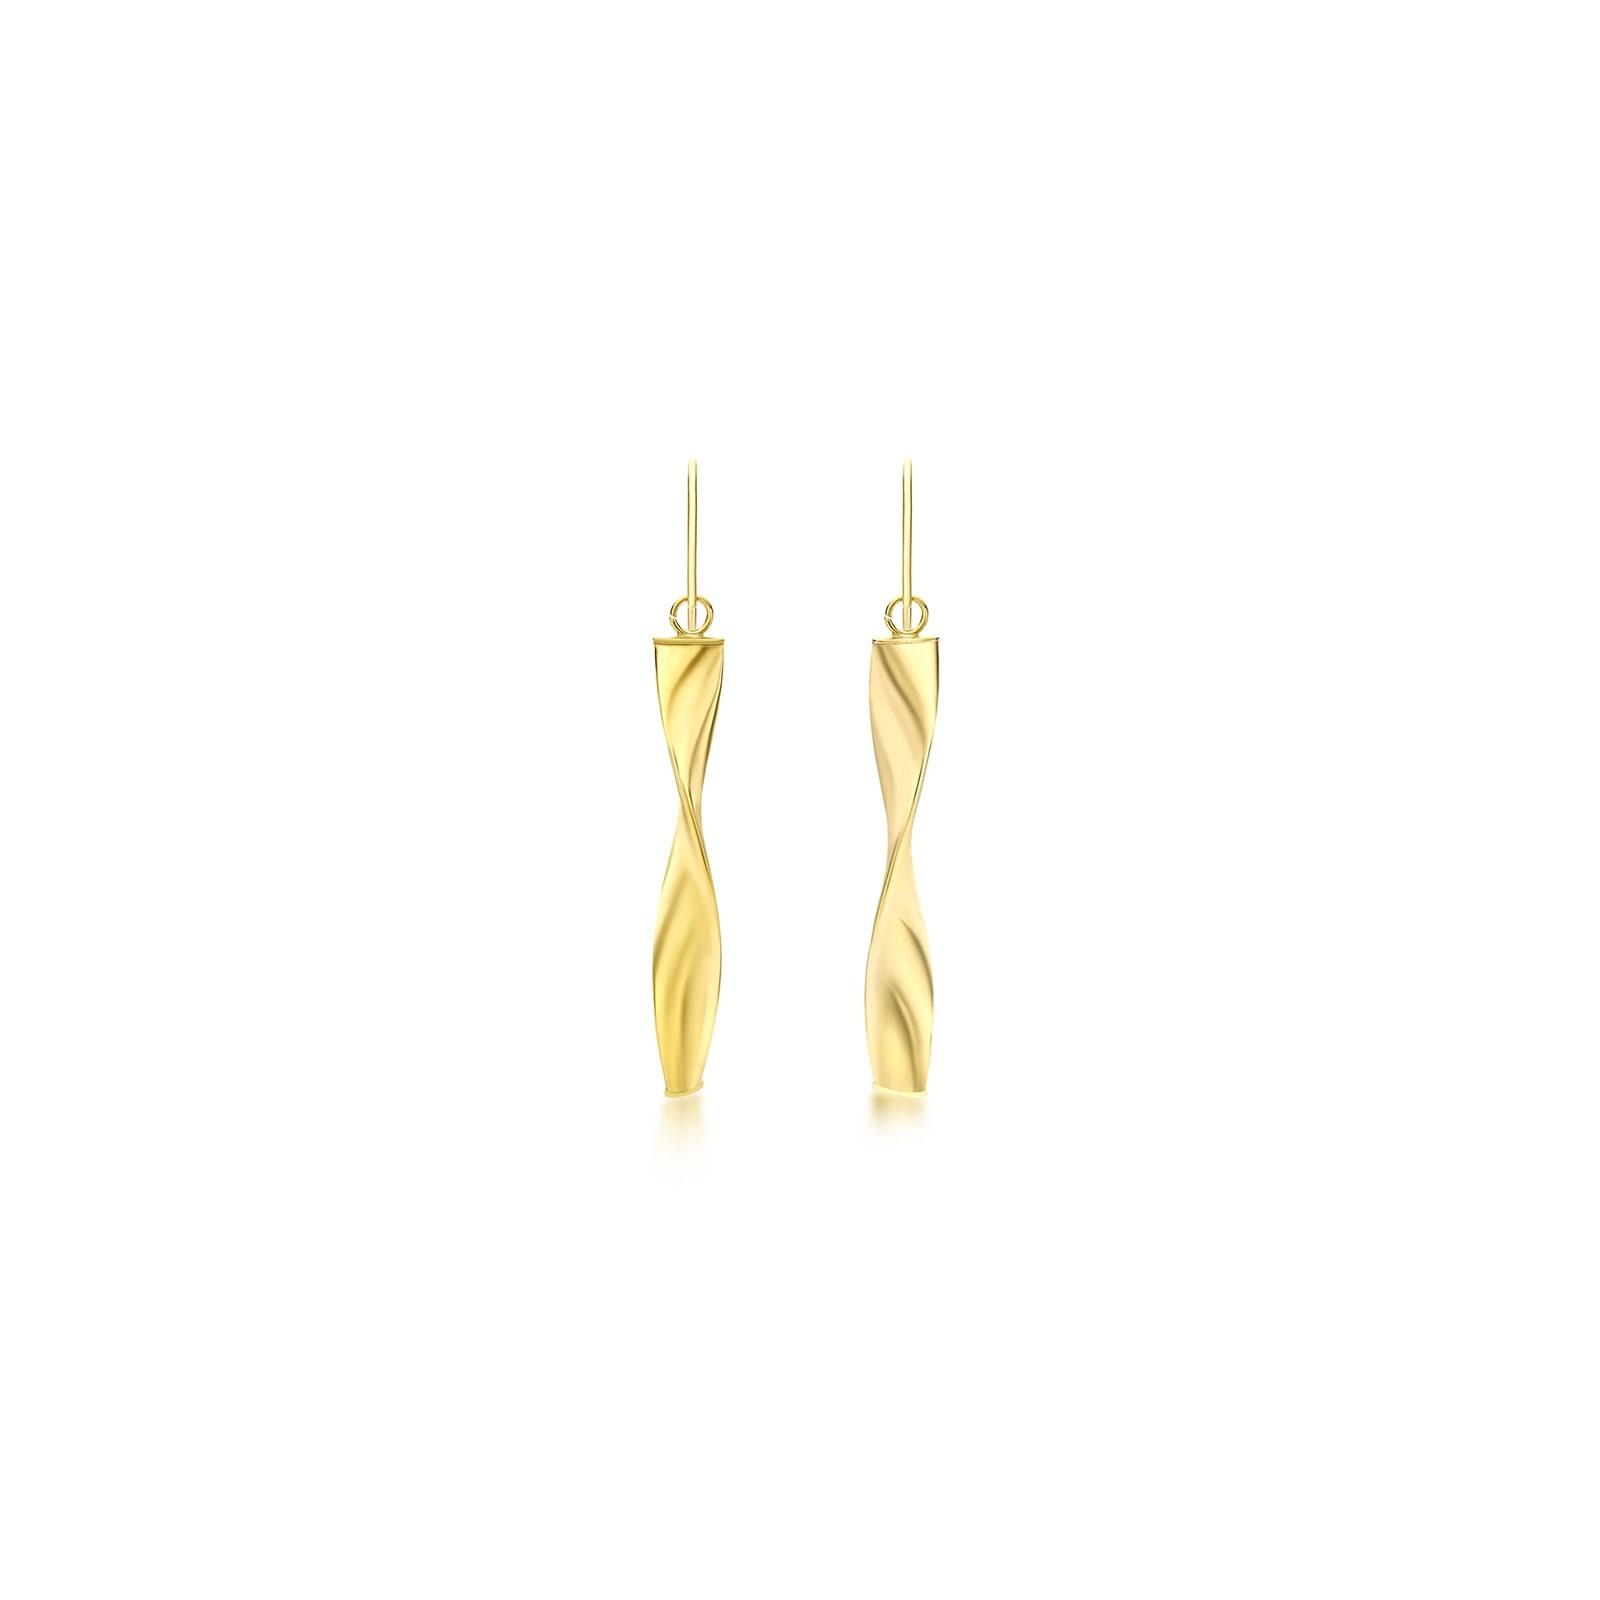 Örhängen 9K Guld - Stavar